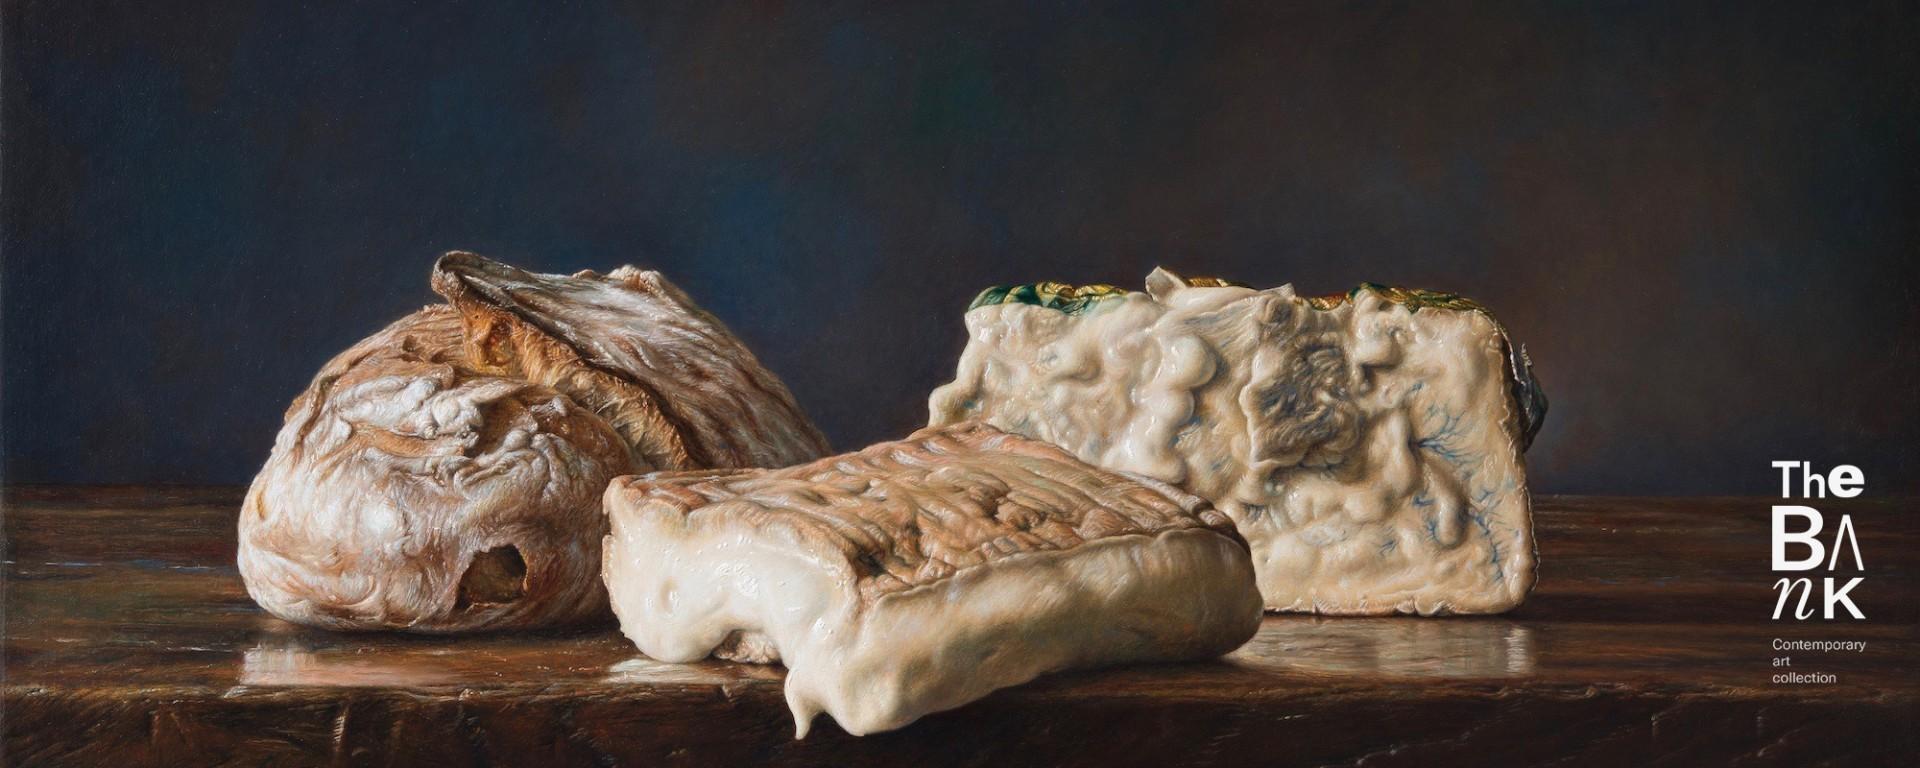 Salamon Fine Art Contemporary And Modern Art Old Master